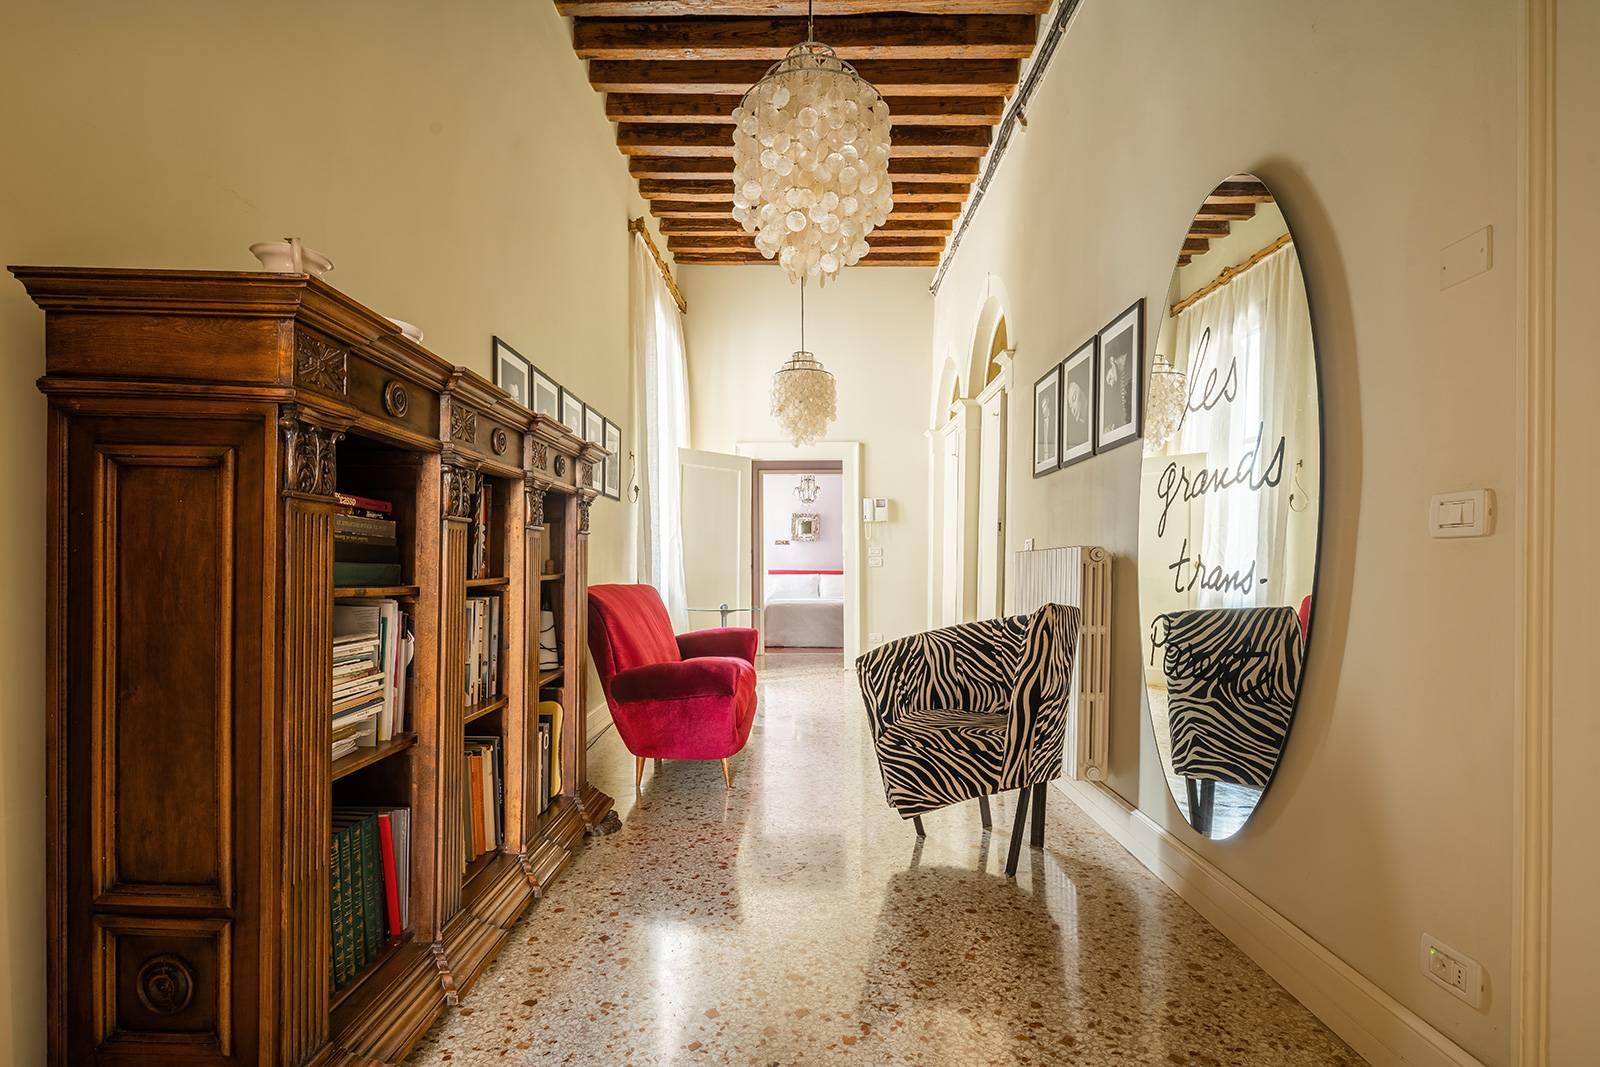 also the central entrance room is elegantly furnished!